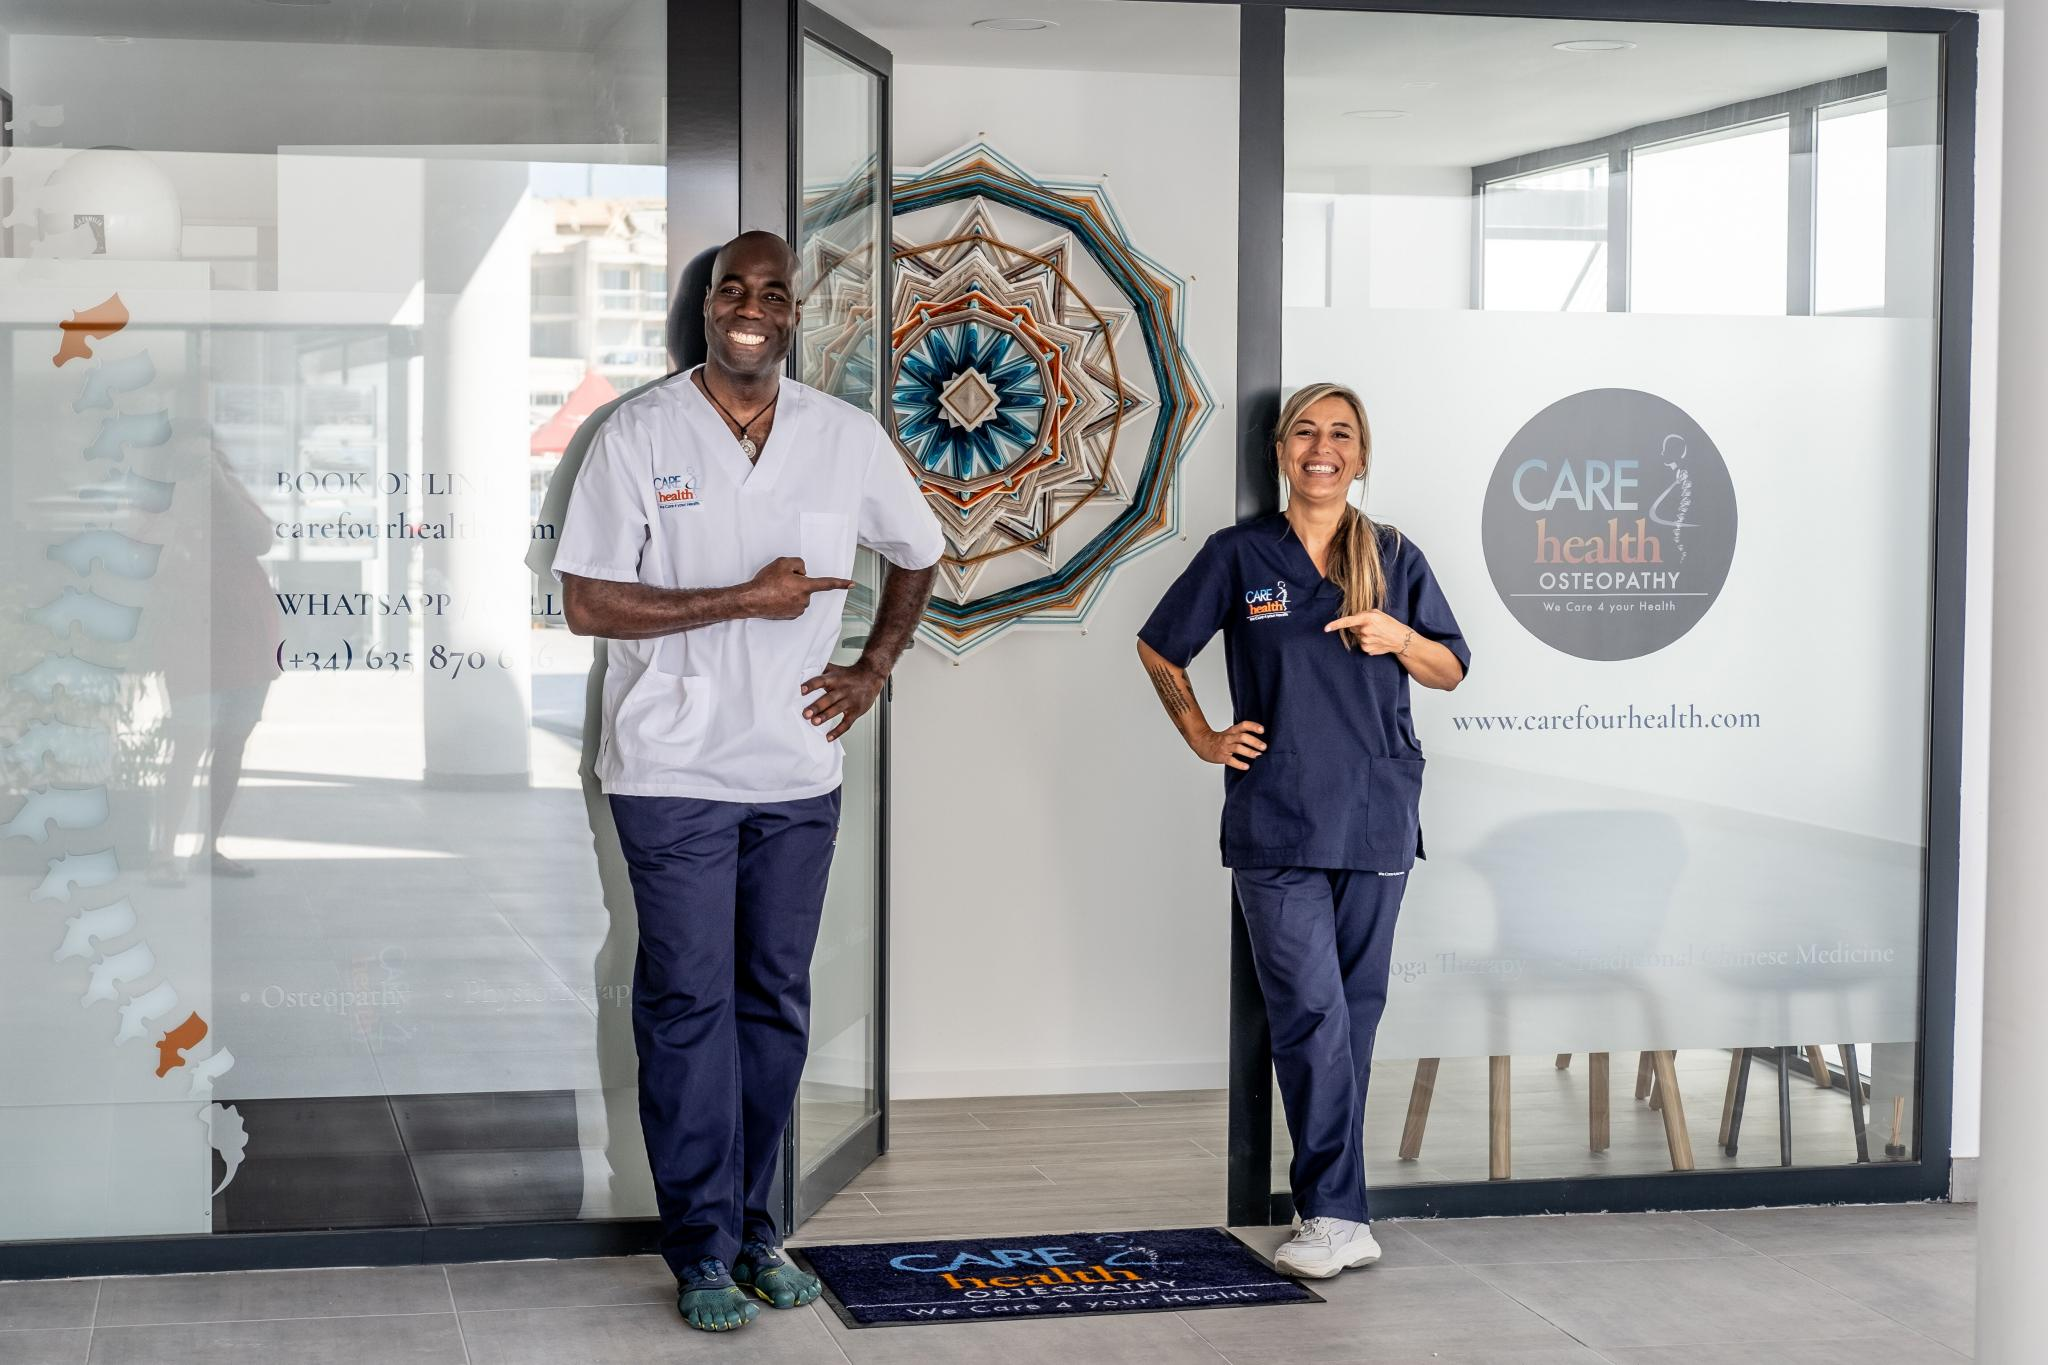 Joe and Amanda from Care 4 Health